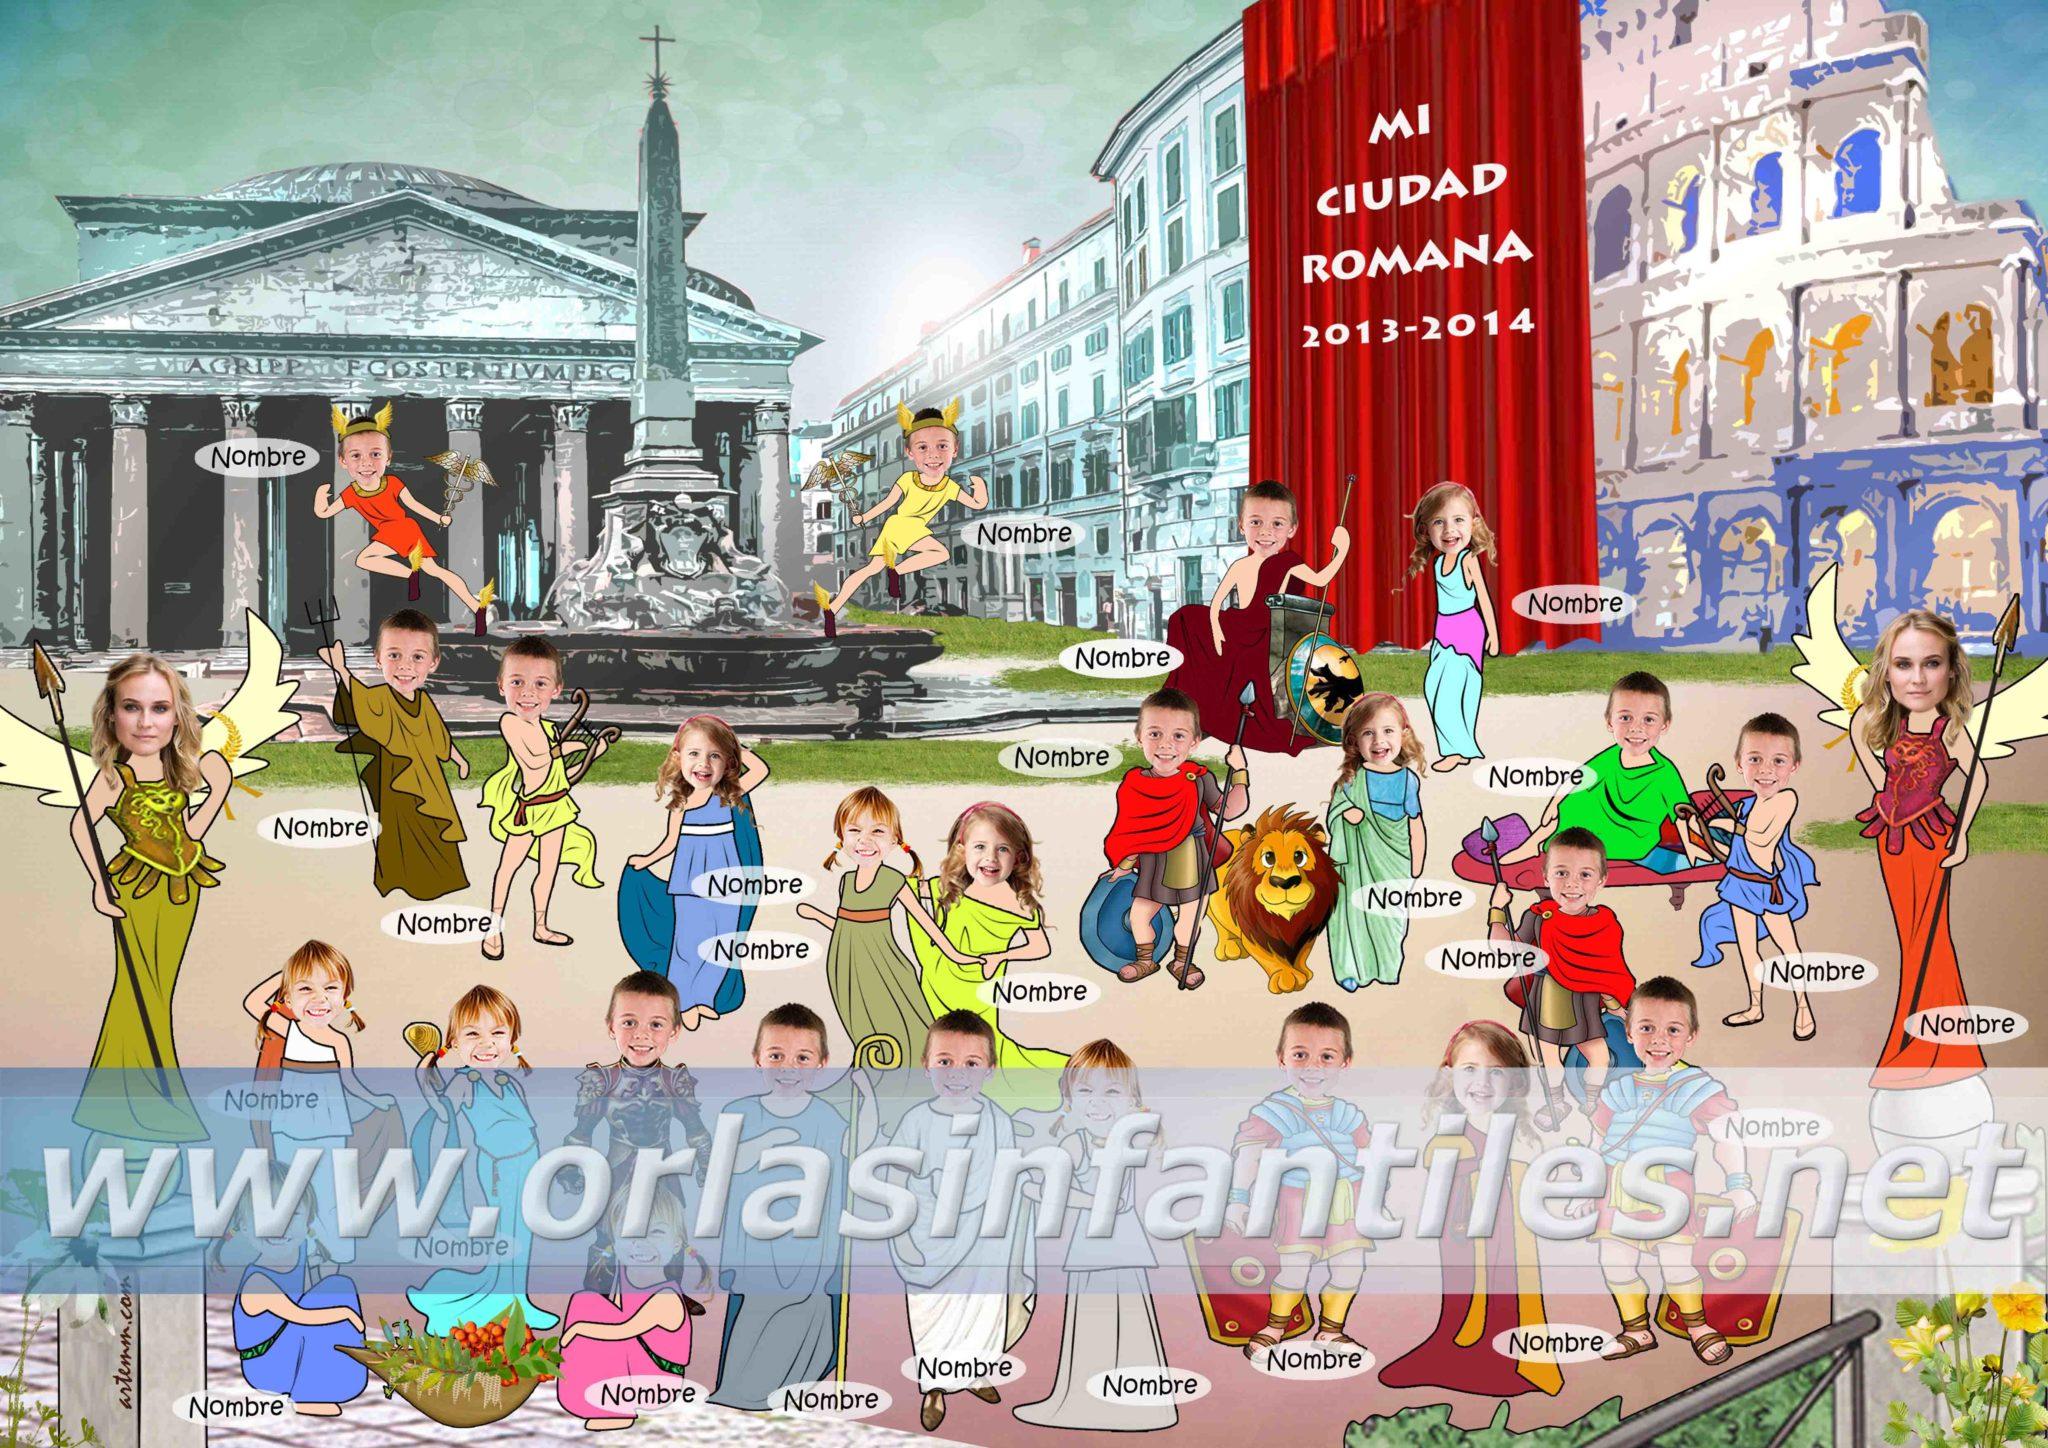 Orla Mi ciudad romana